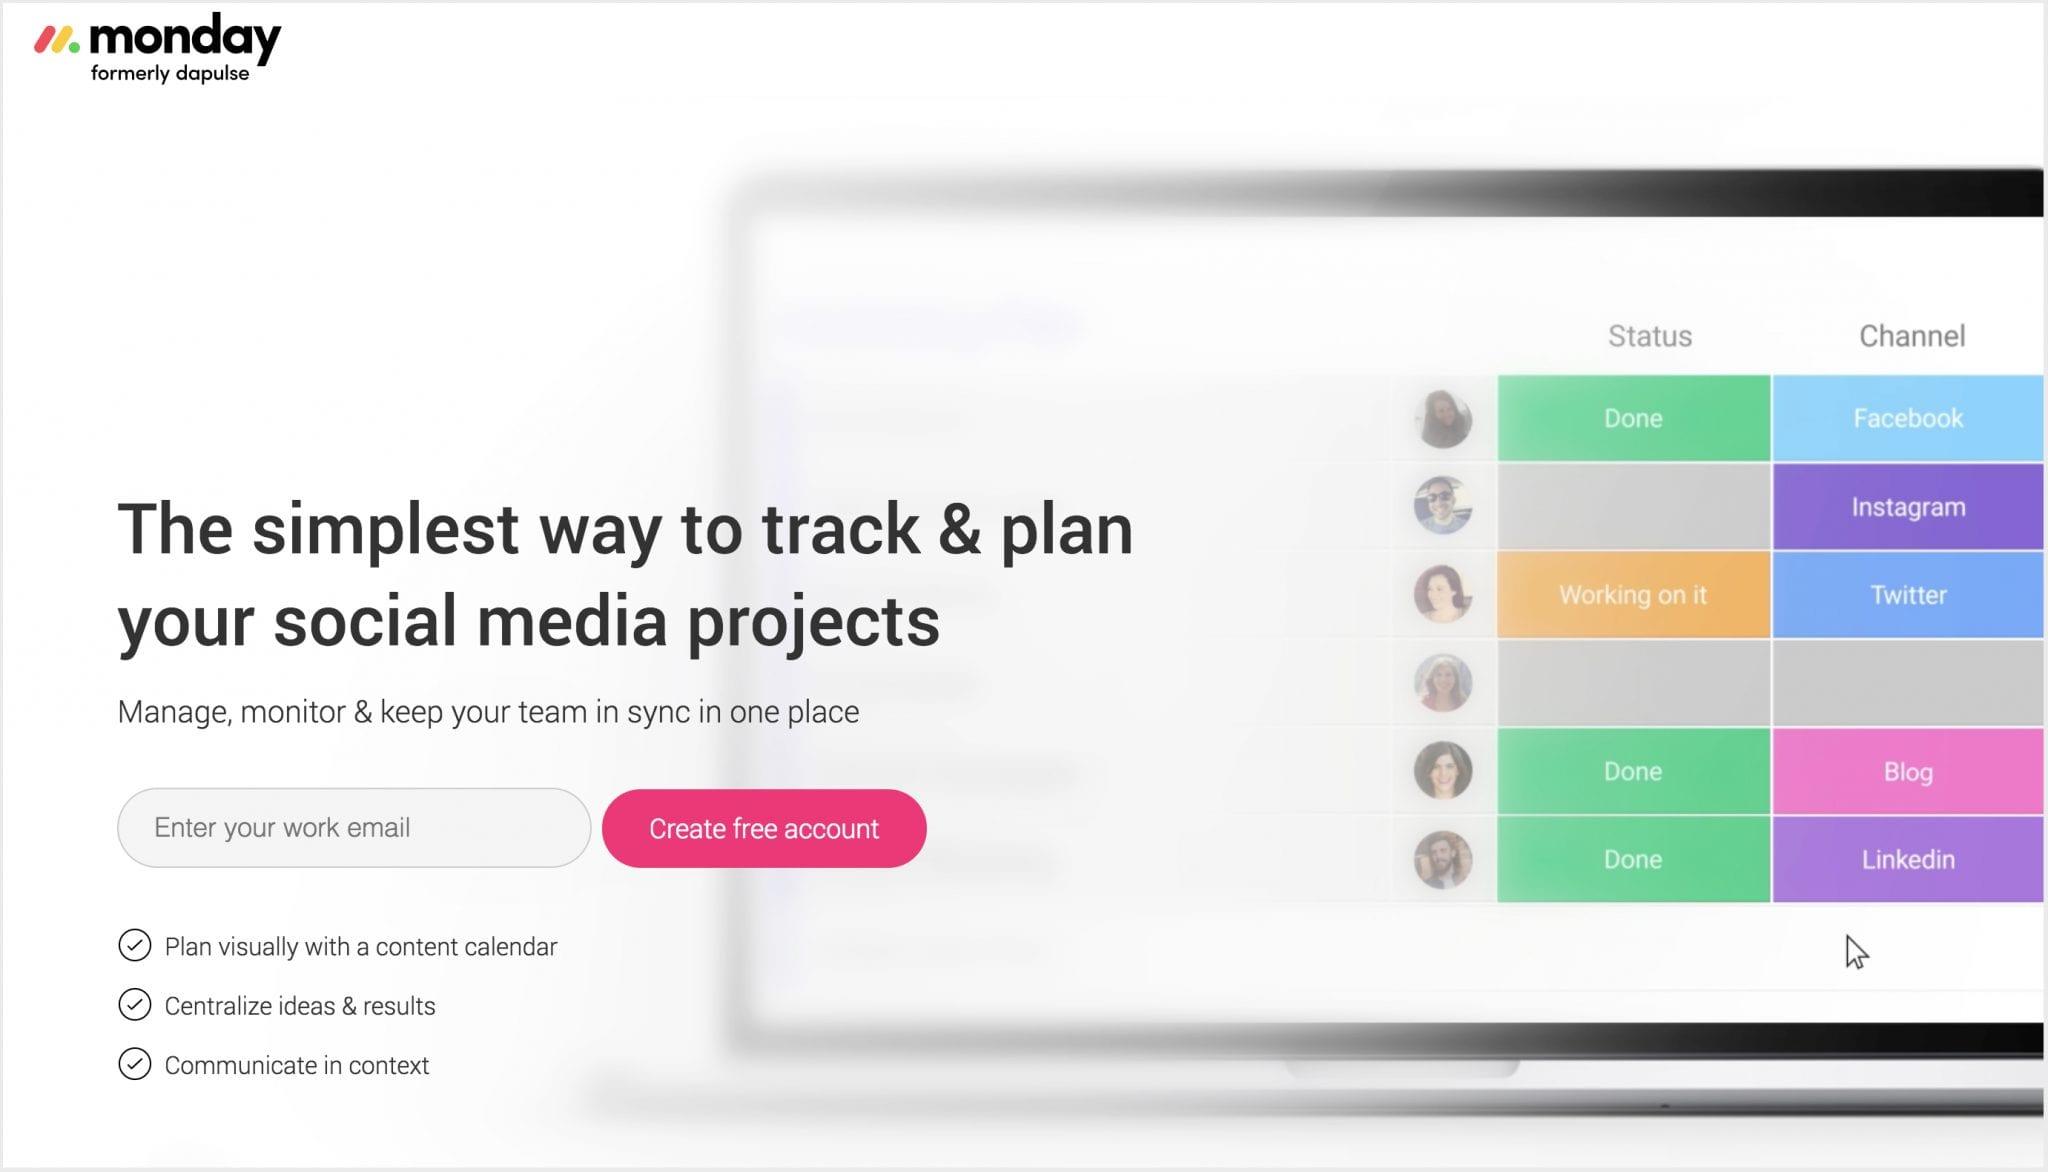 monday.com connects remote teams